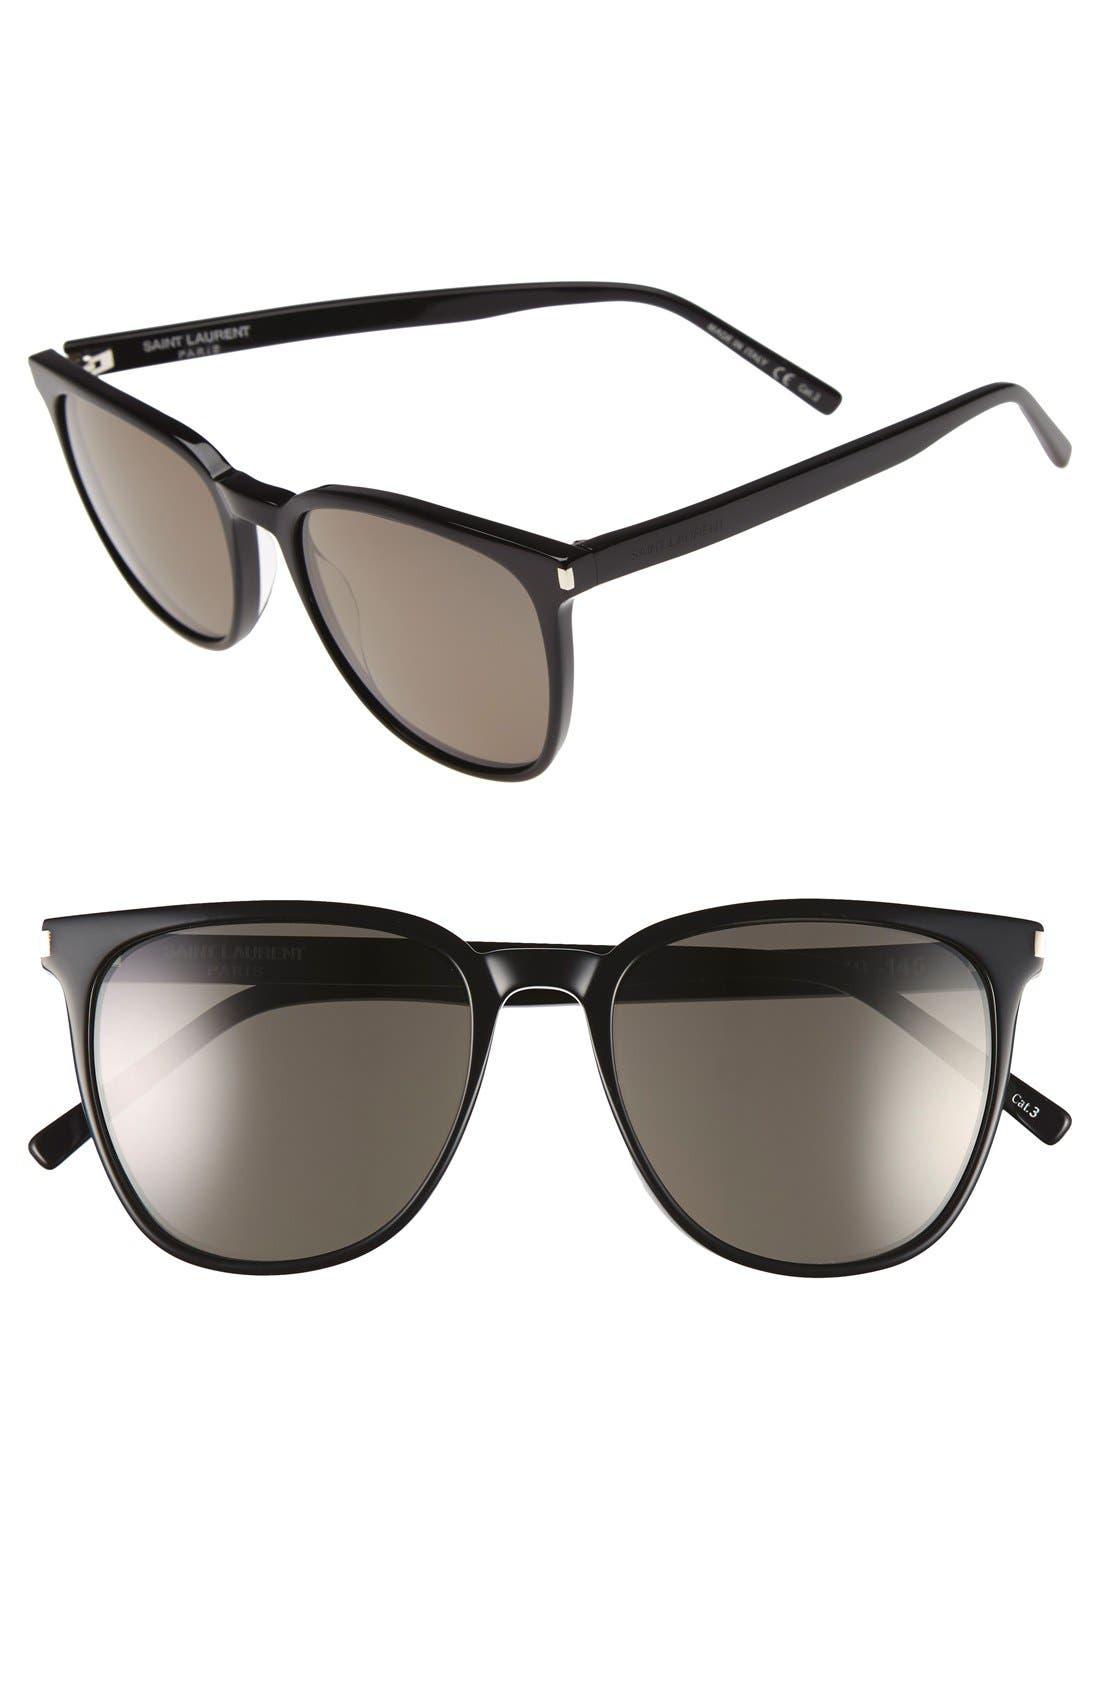 Main Image - Saint Laurent 54mm Sunglasses